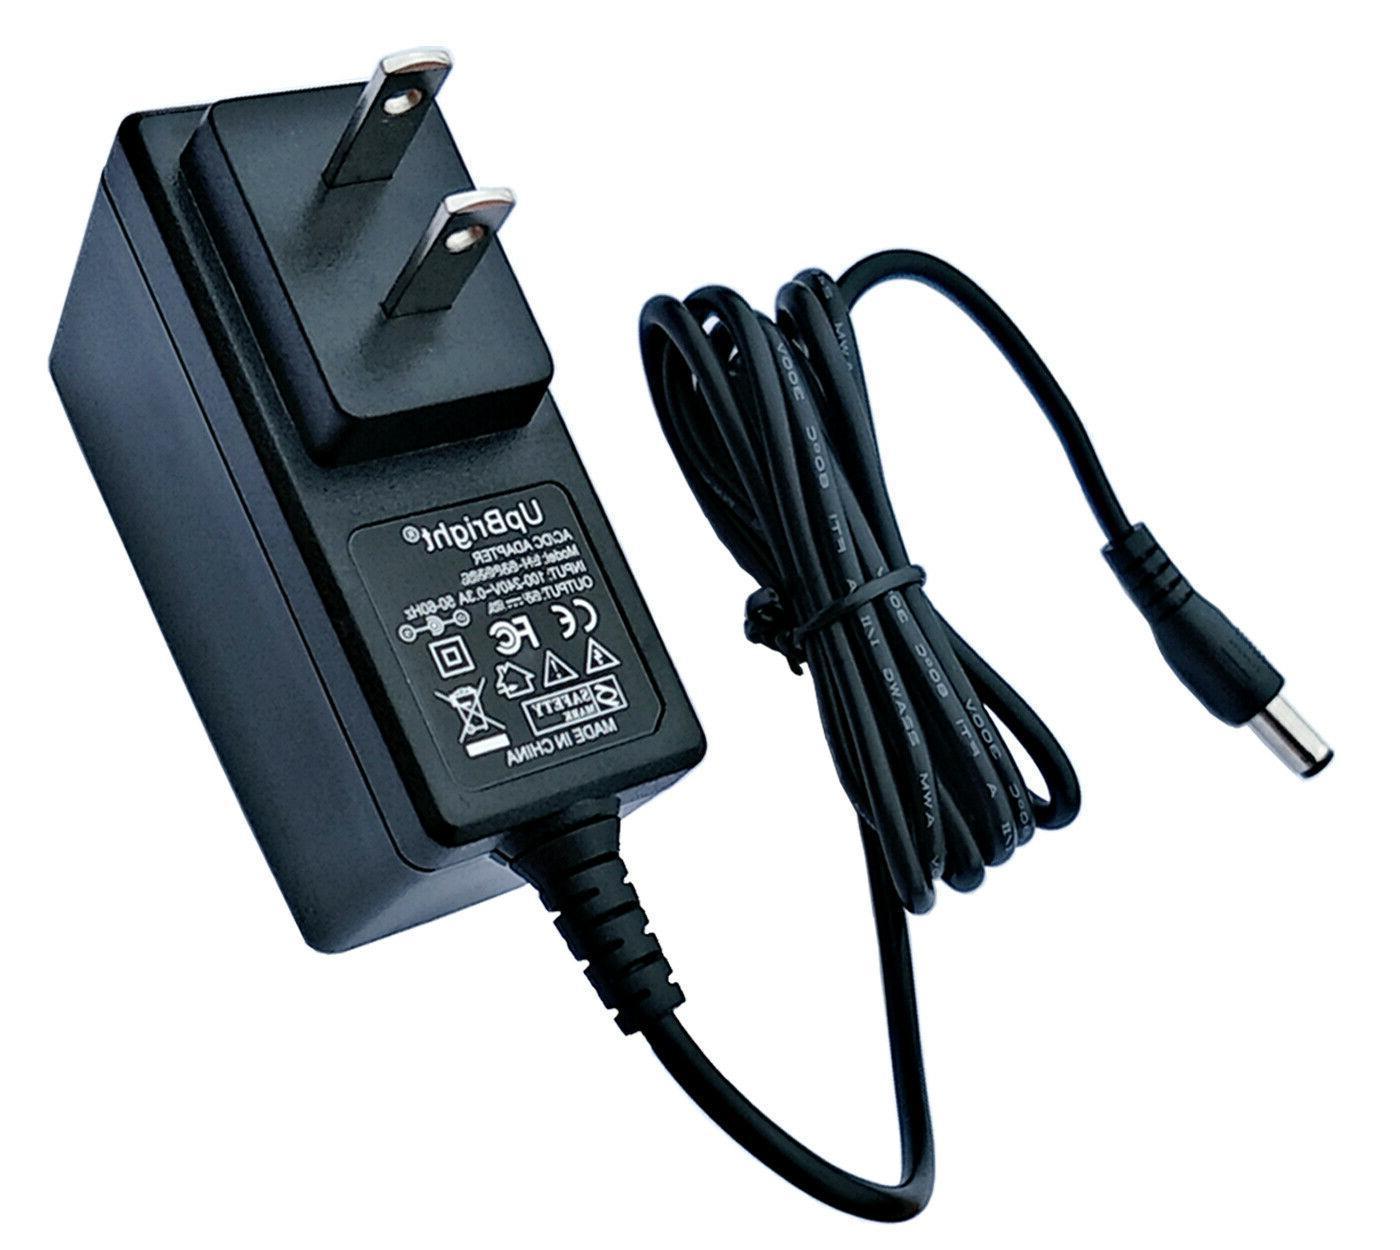 NEW AC Adapter For RCA T-T006 UD100050C 10VDC or 10VAC 9VAC